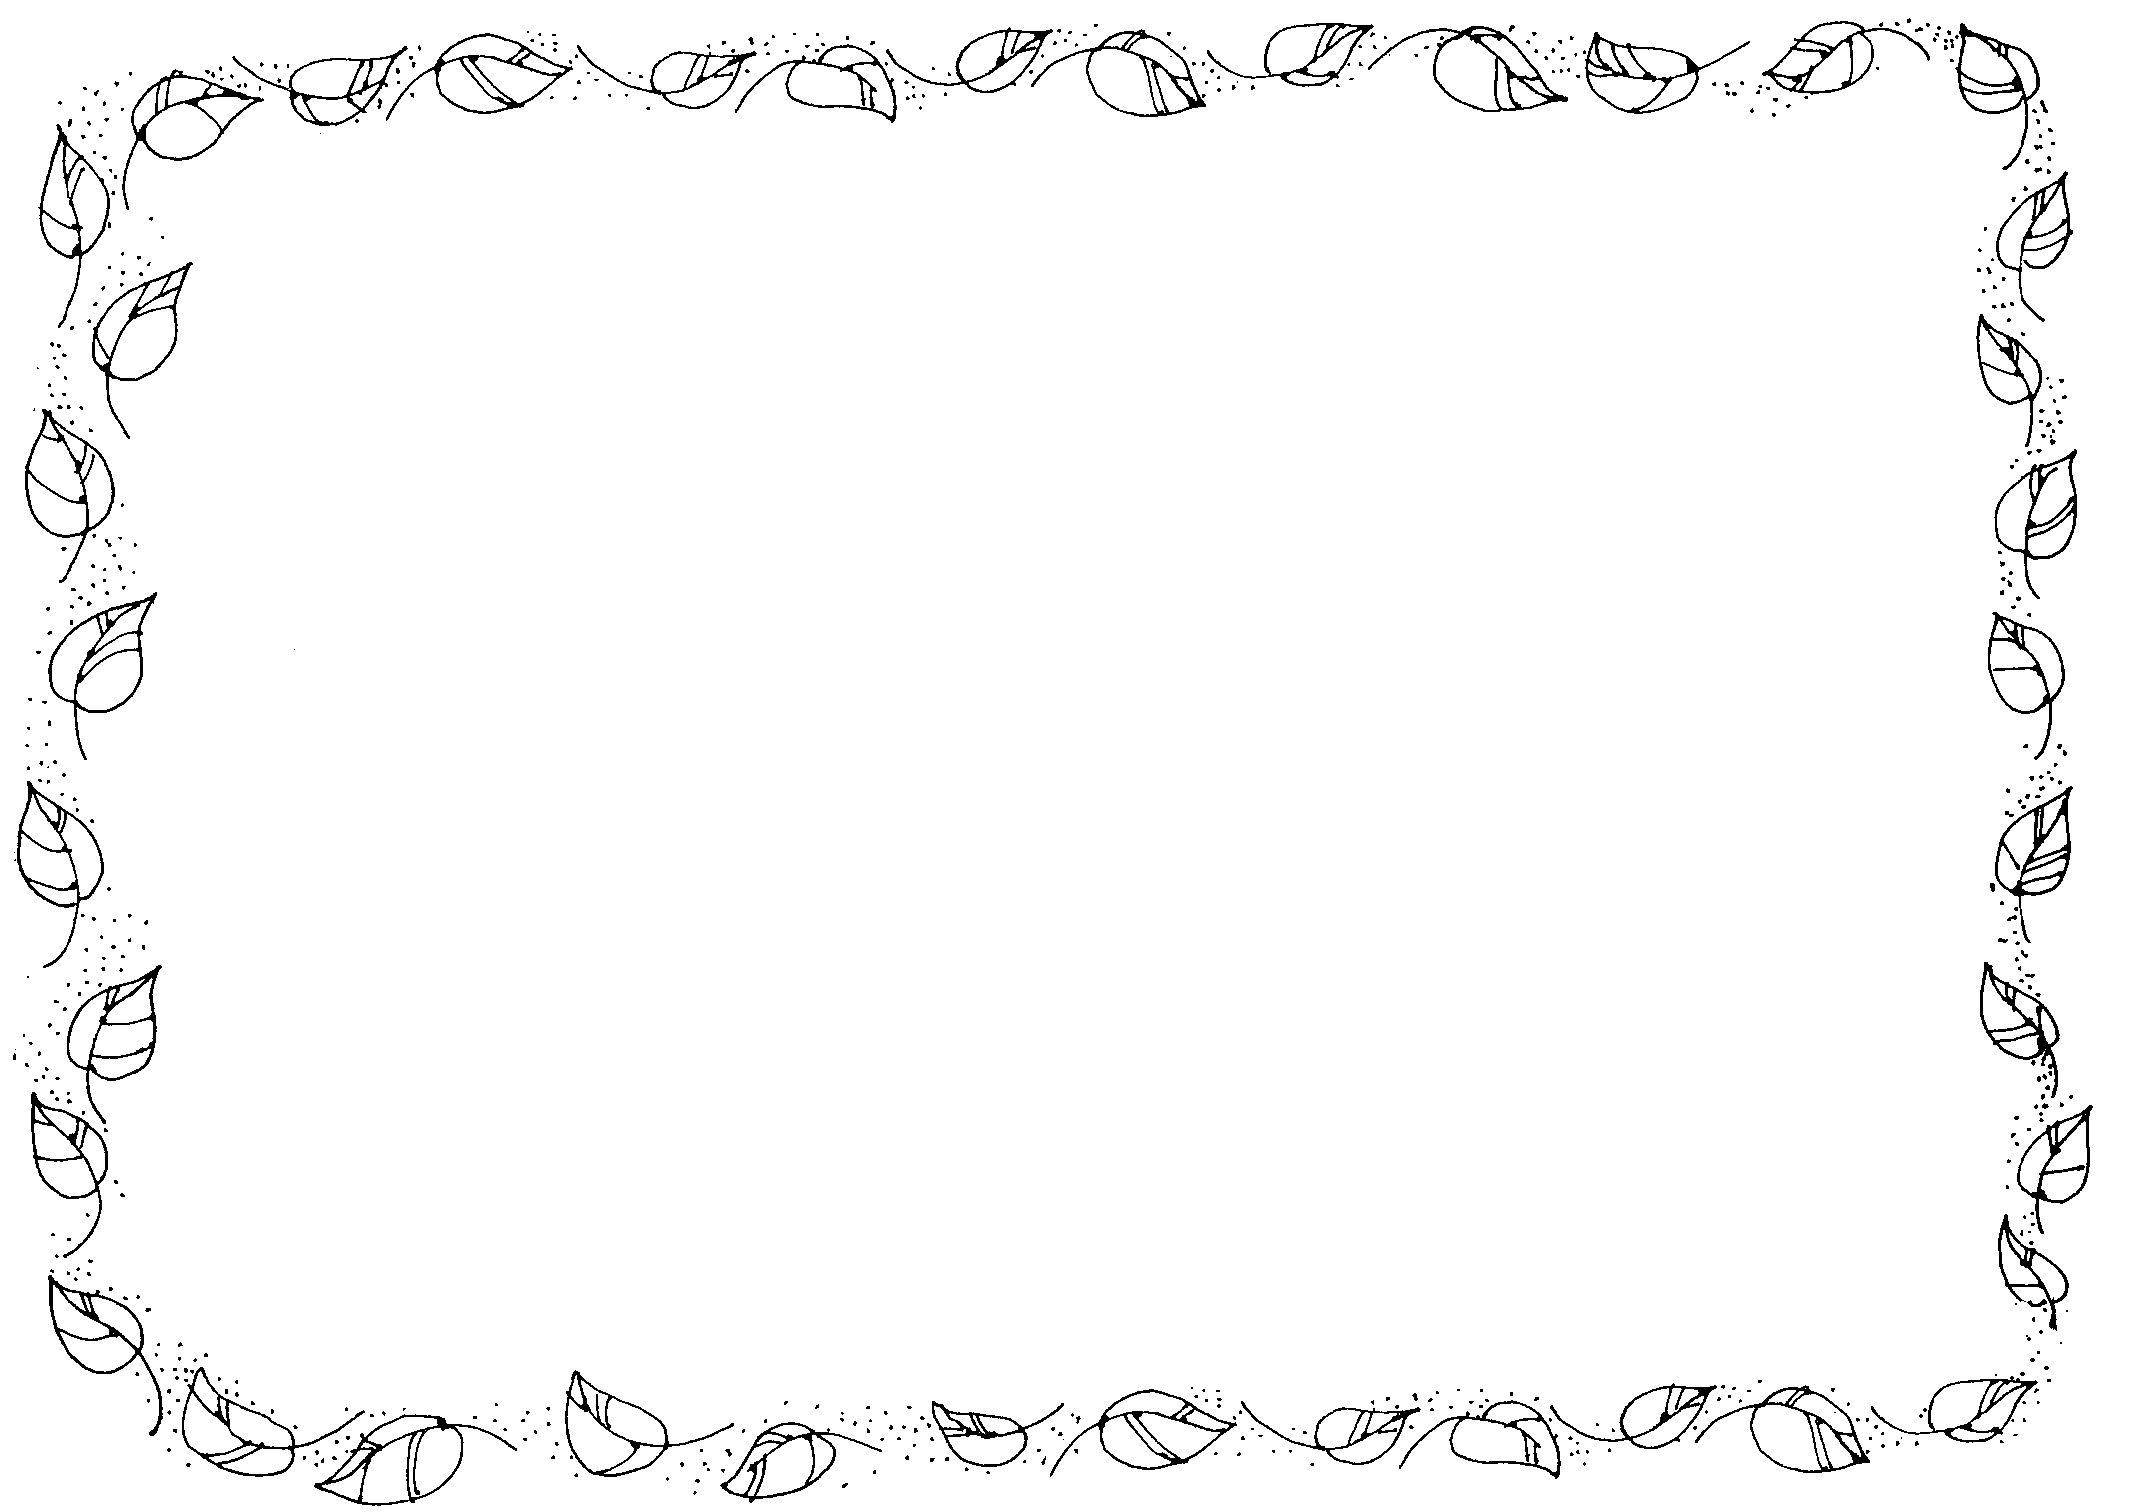 Clipartsgram Image 1392486824 Cgborder Leaf 1